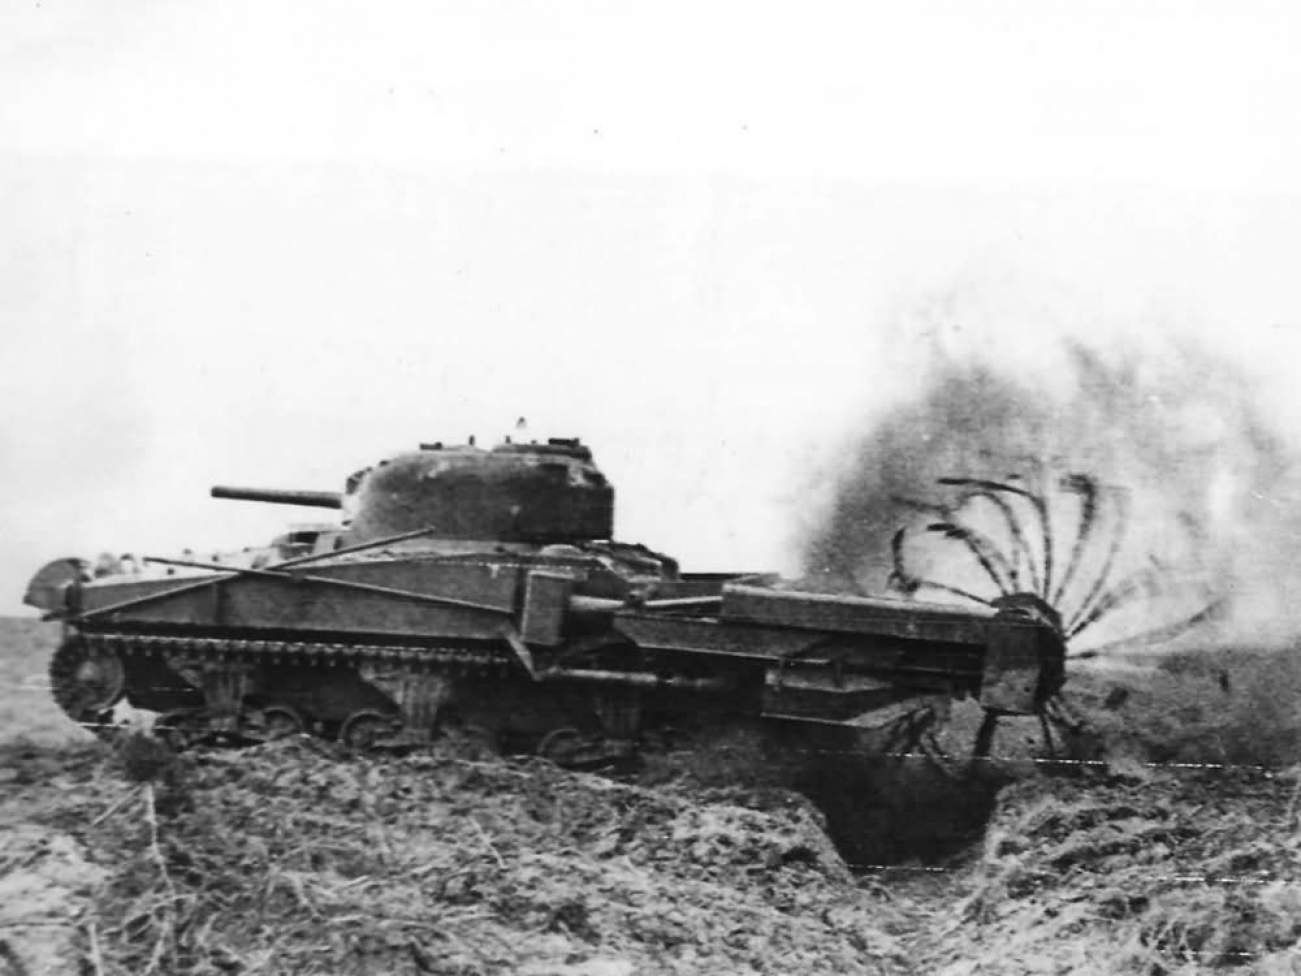 The U.S. Marines Are Bringing Back World War II Crab Tanks